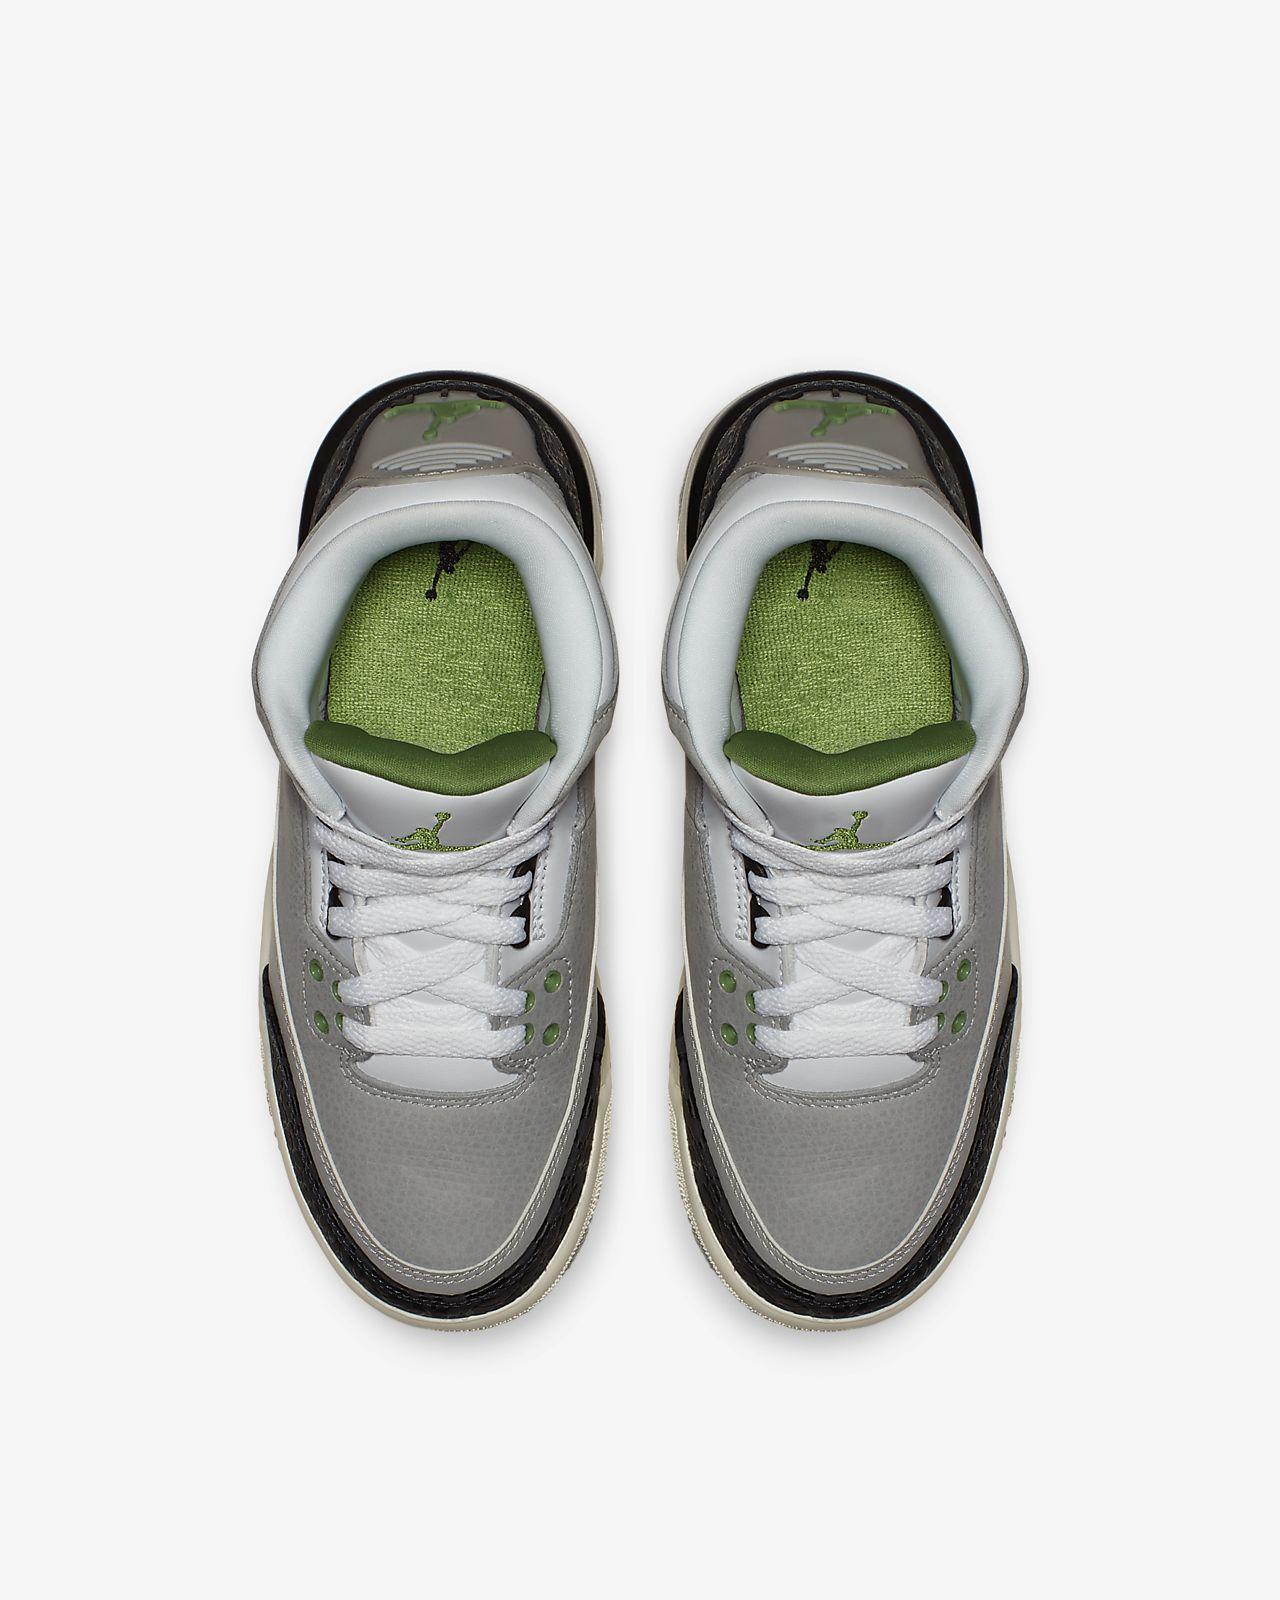 promo code a4866 d0b44 ... Air Jordan 3 Retro Kids  Shoe